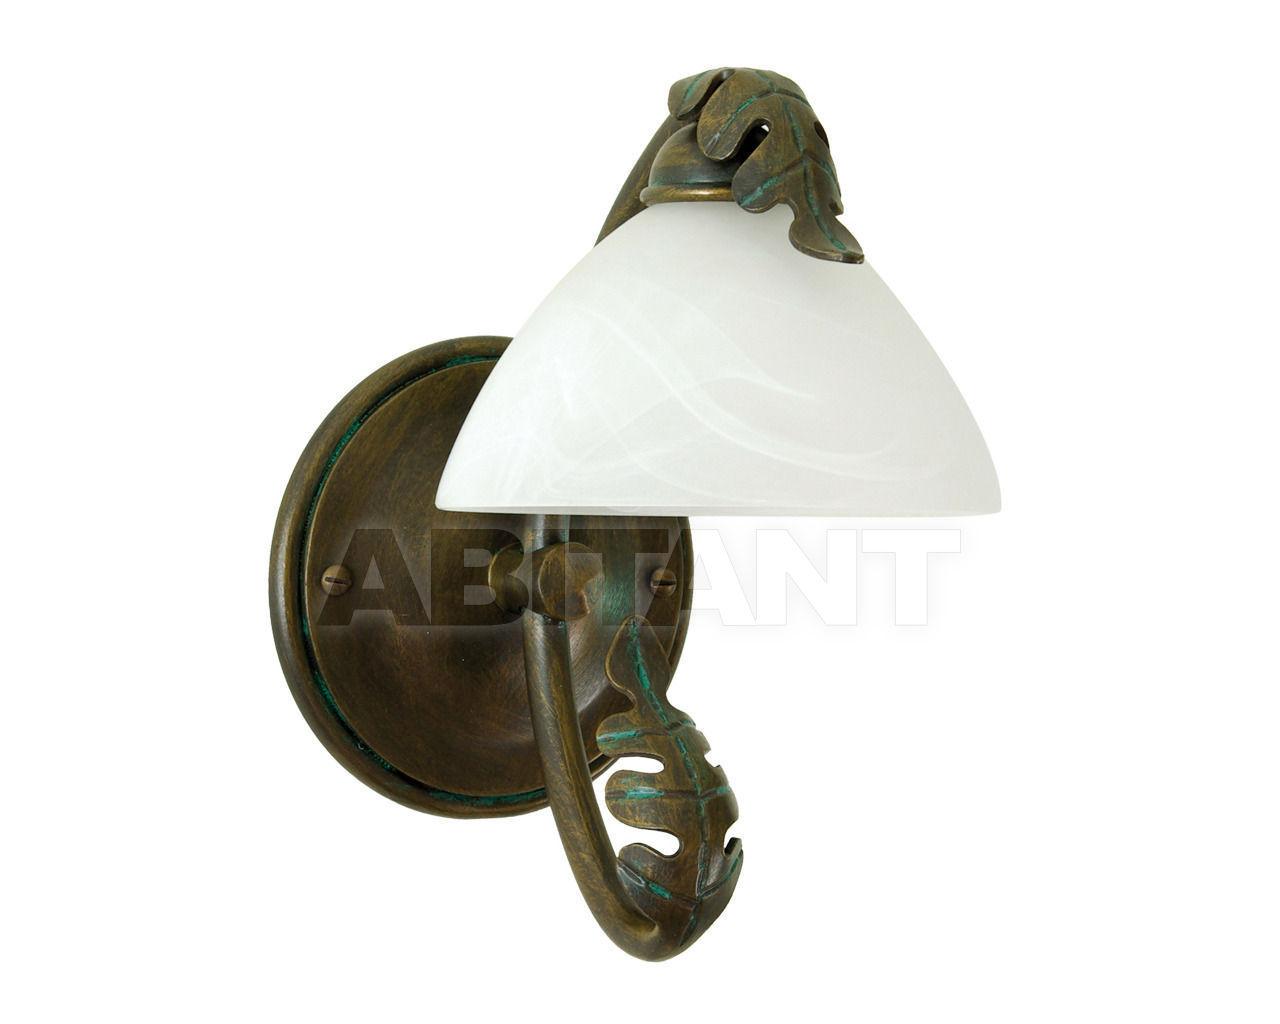 Купить Светильник настенный FMB Leuchten Schmiedeeisen Lampen Und Leuchten 94335